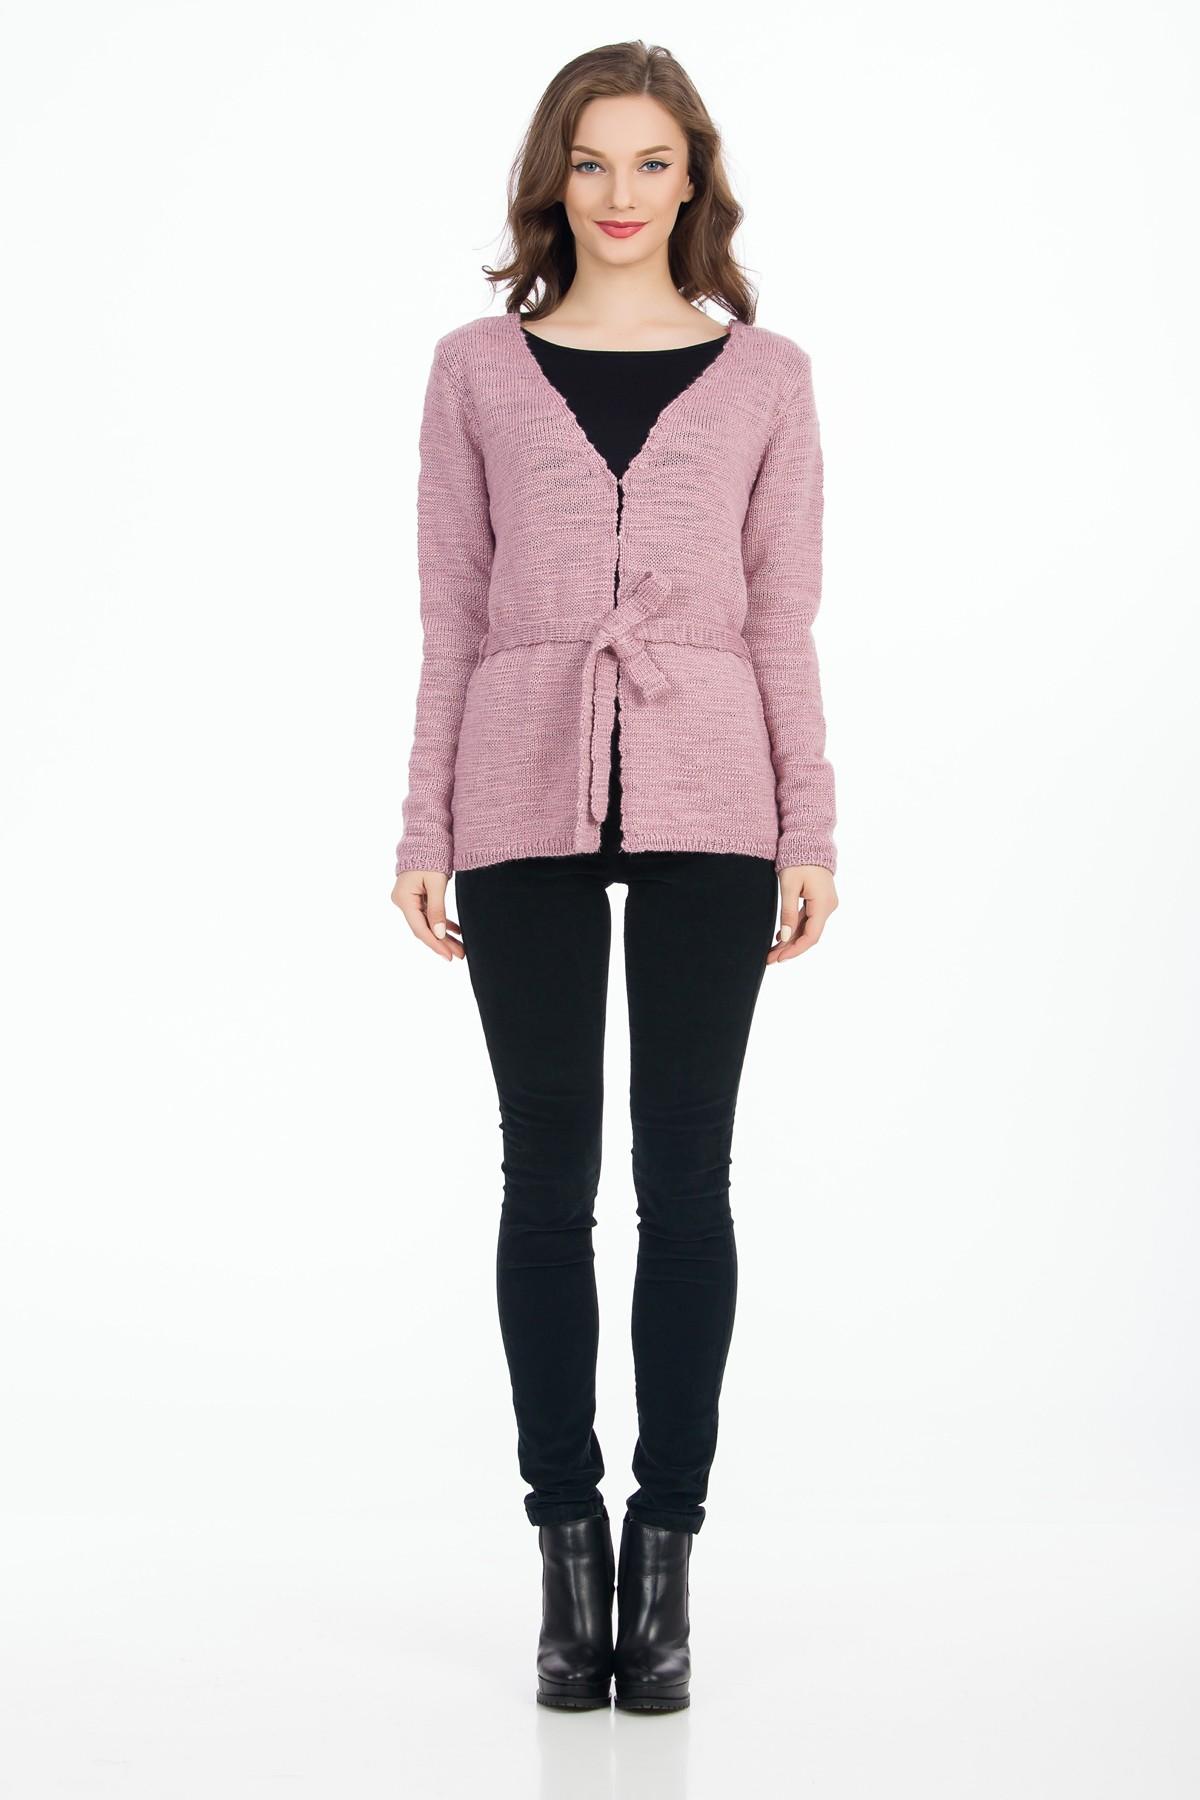 cardigan-tricot-roz-pastel-sense